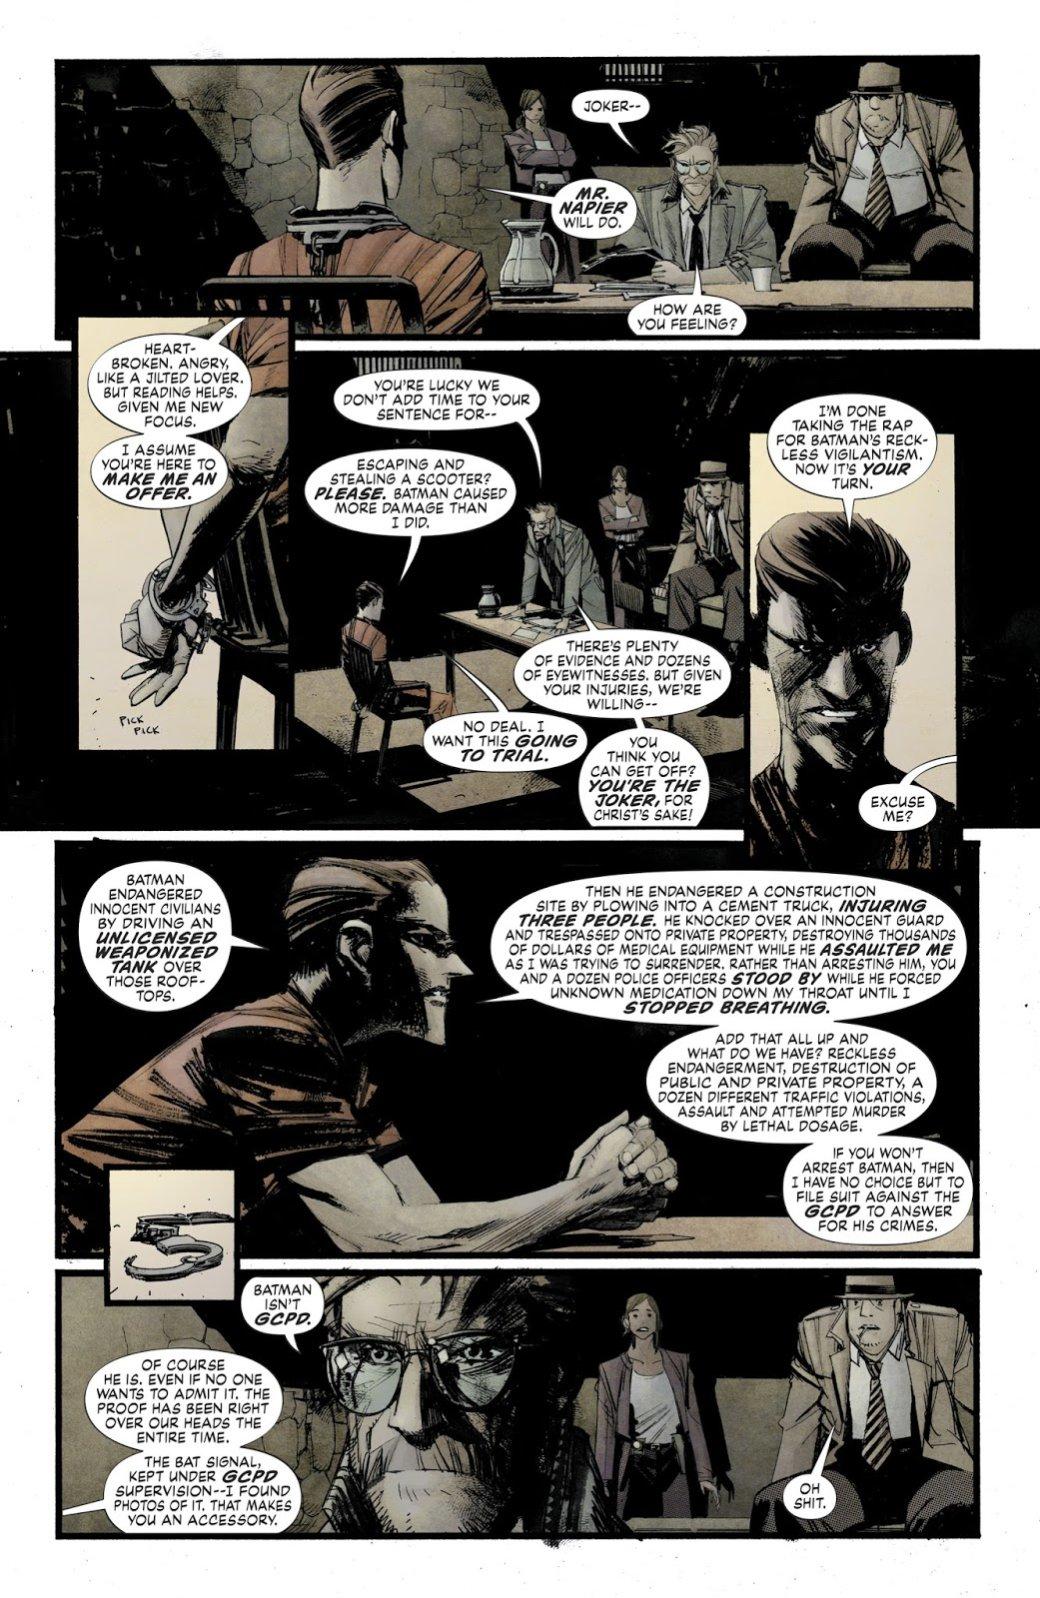 Открытия 2017— комиксы: Star-Lord, Infamous Iron Man, Batman: The White Knight. - Изображение 10